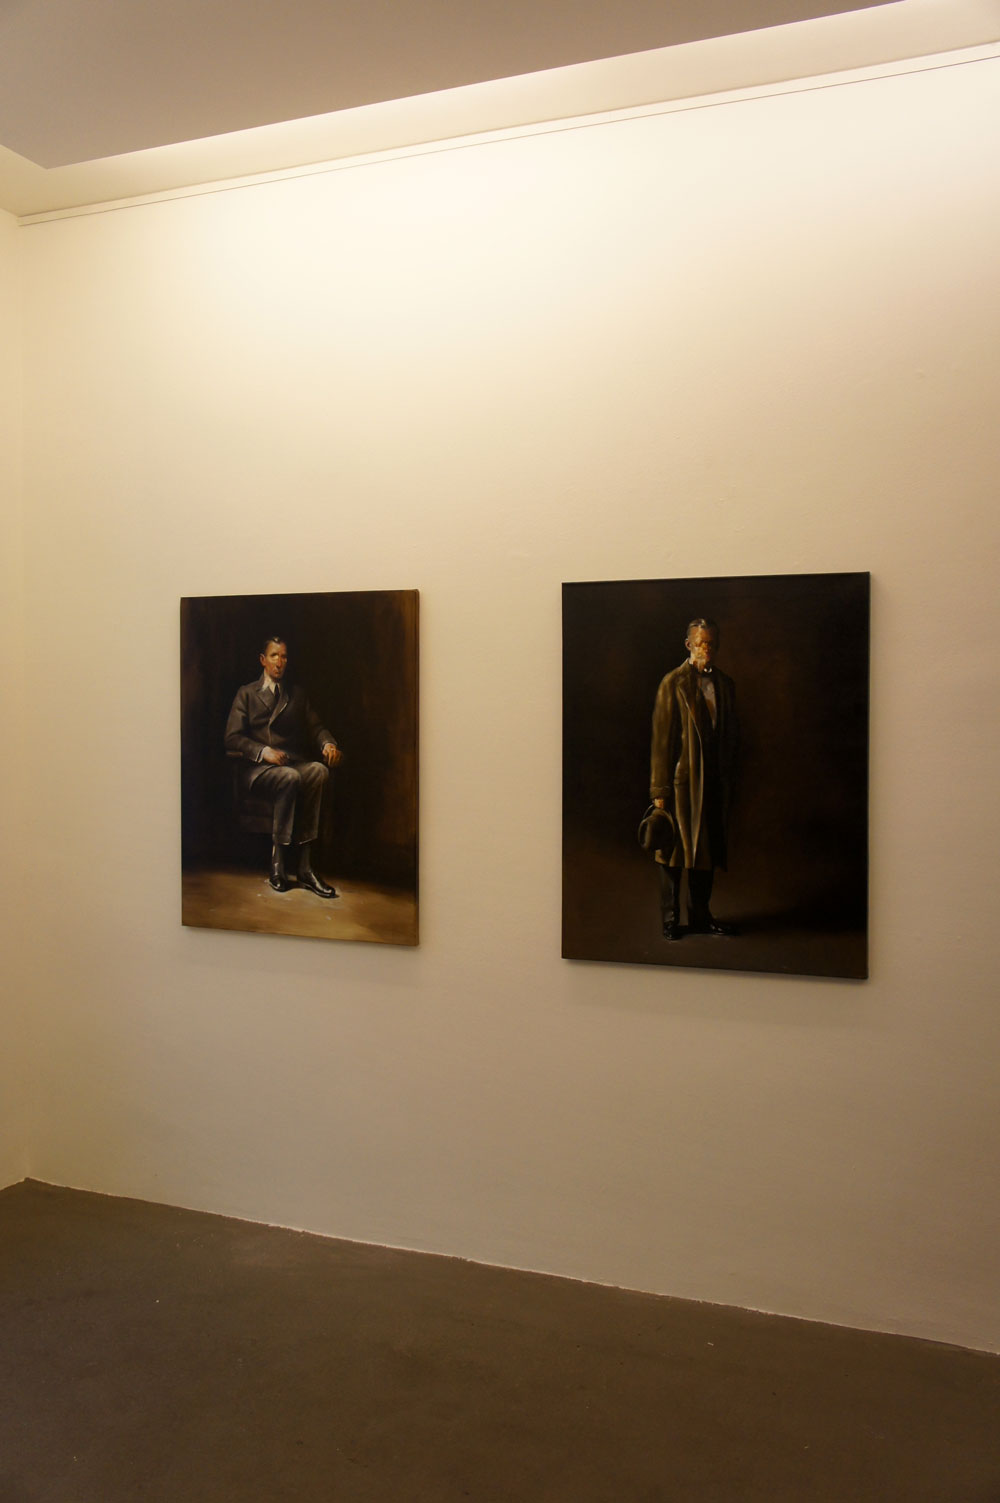 Radu-Belcin-Frozen-Silence-@-Galerie-Martin-Mertens-Berlin-21